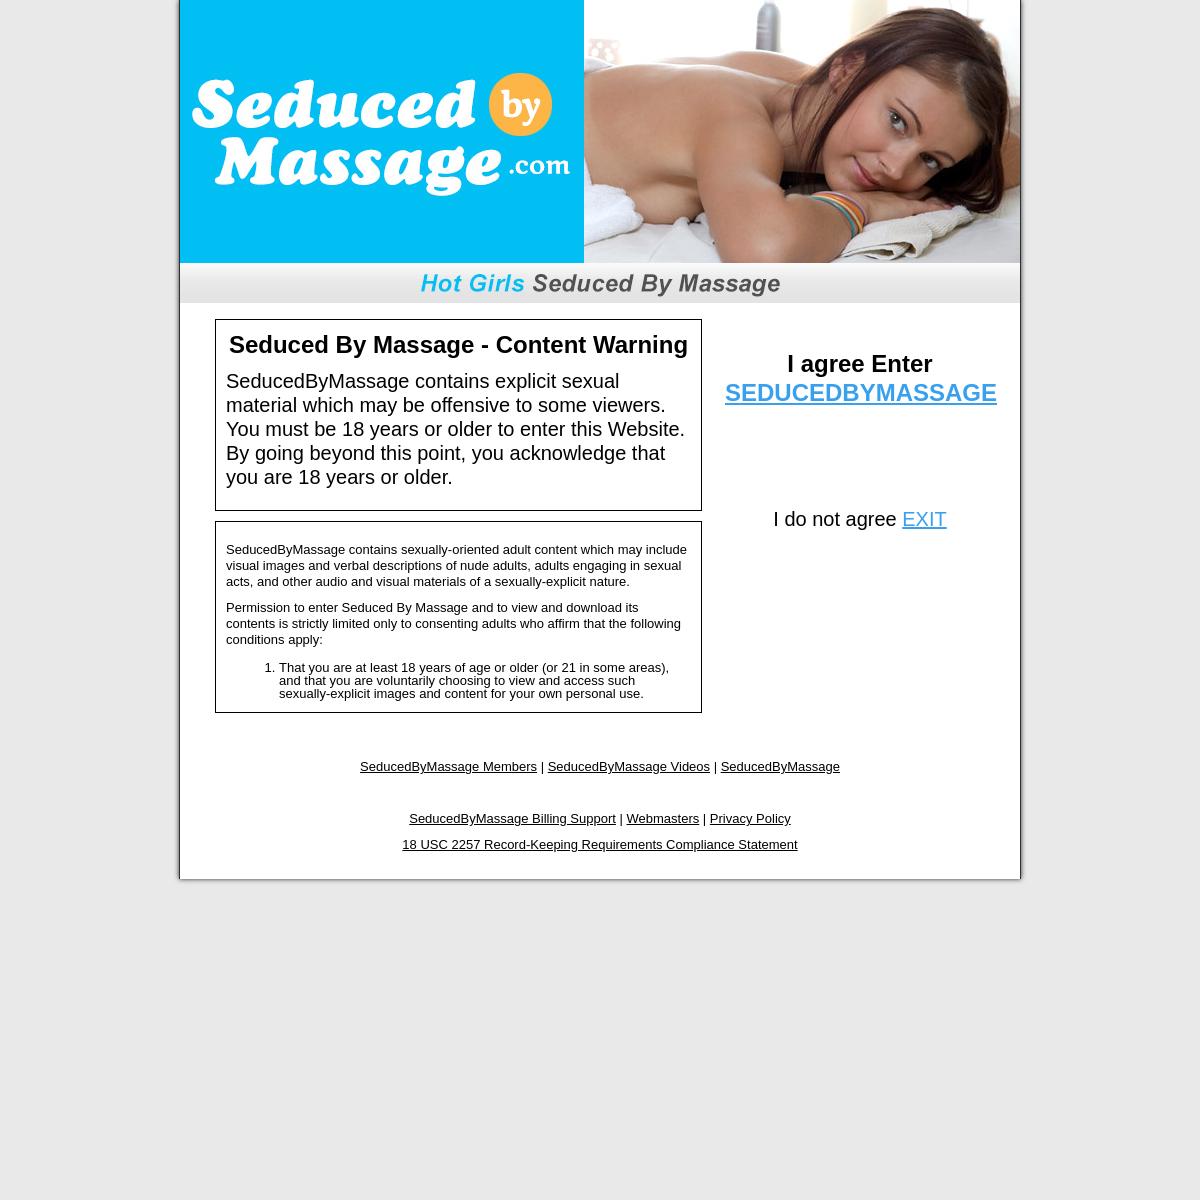 A complete backup of seducedbymassage.com